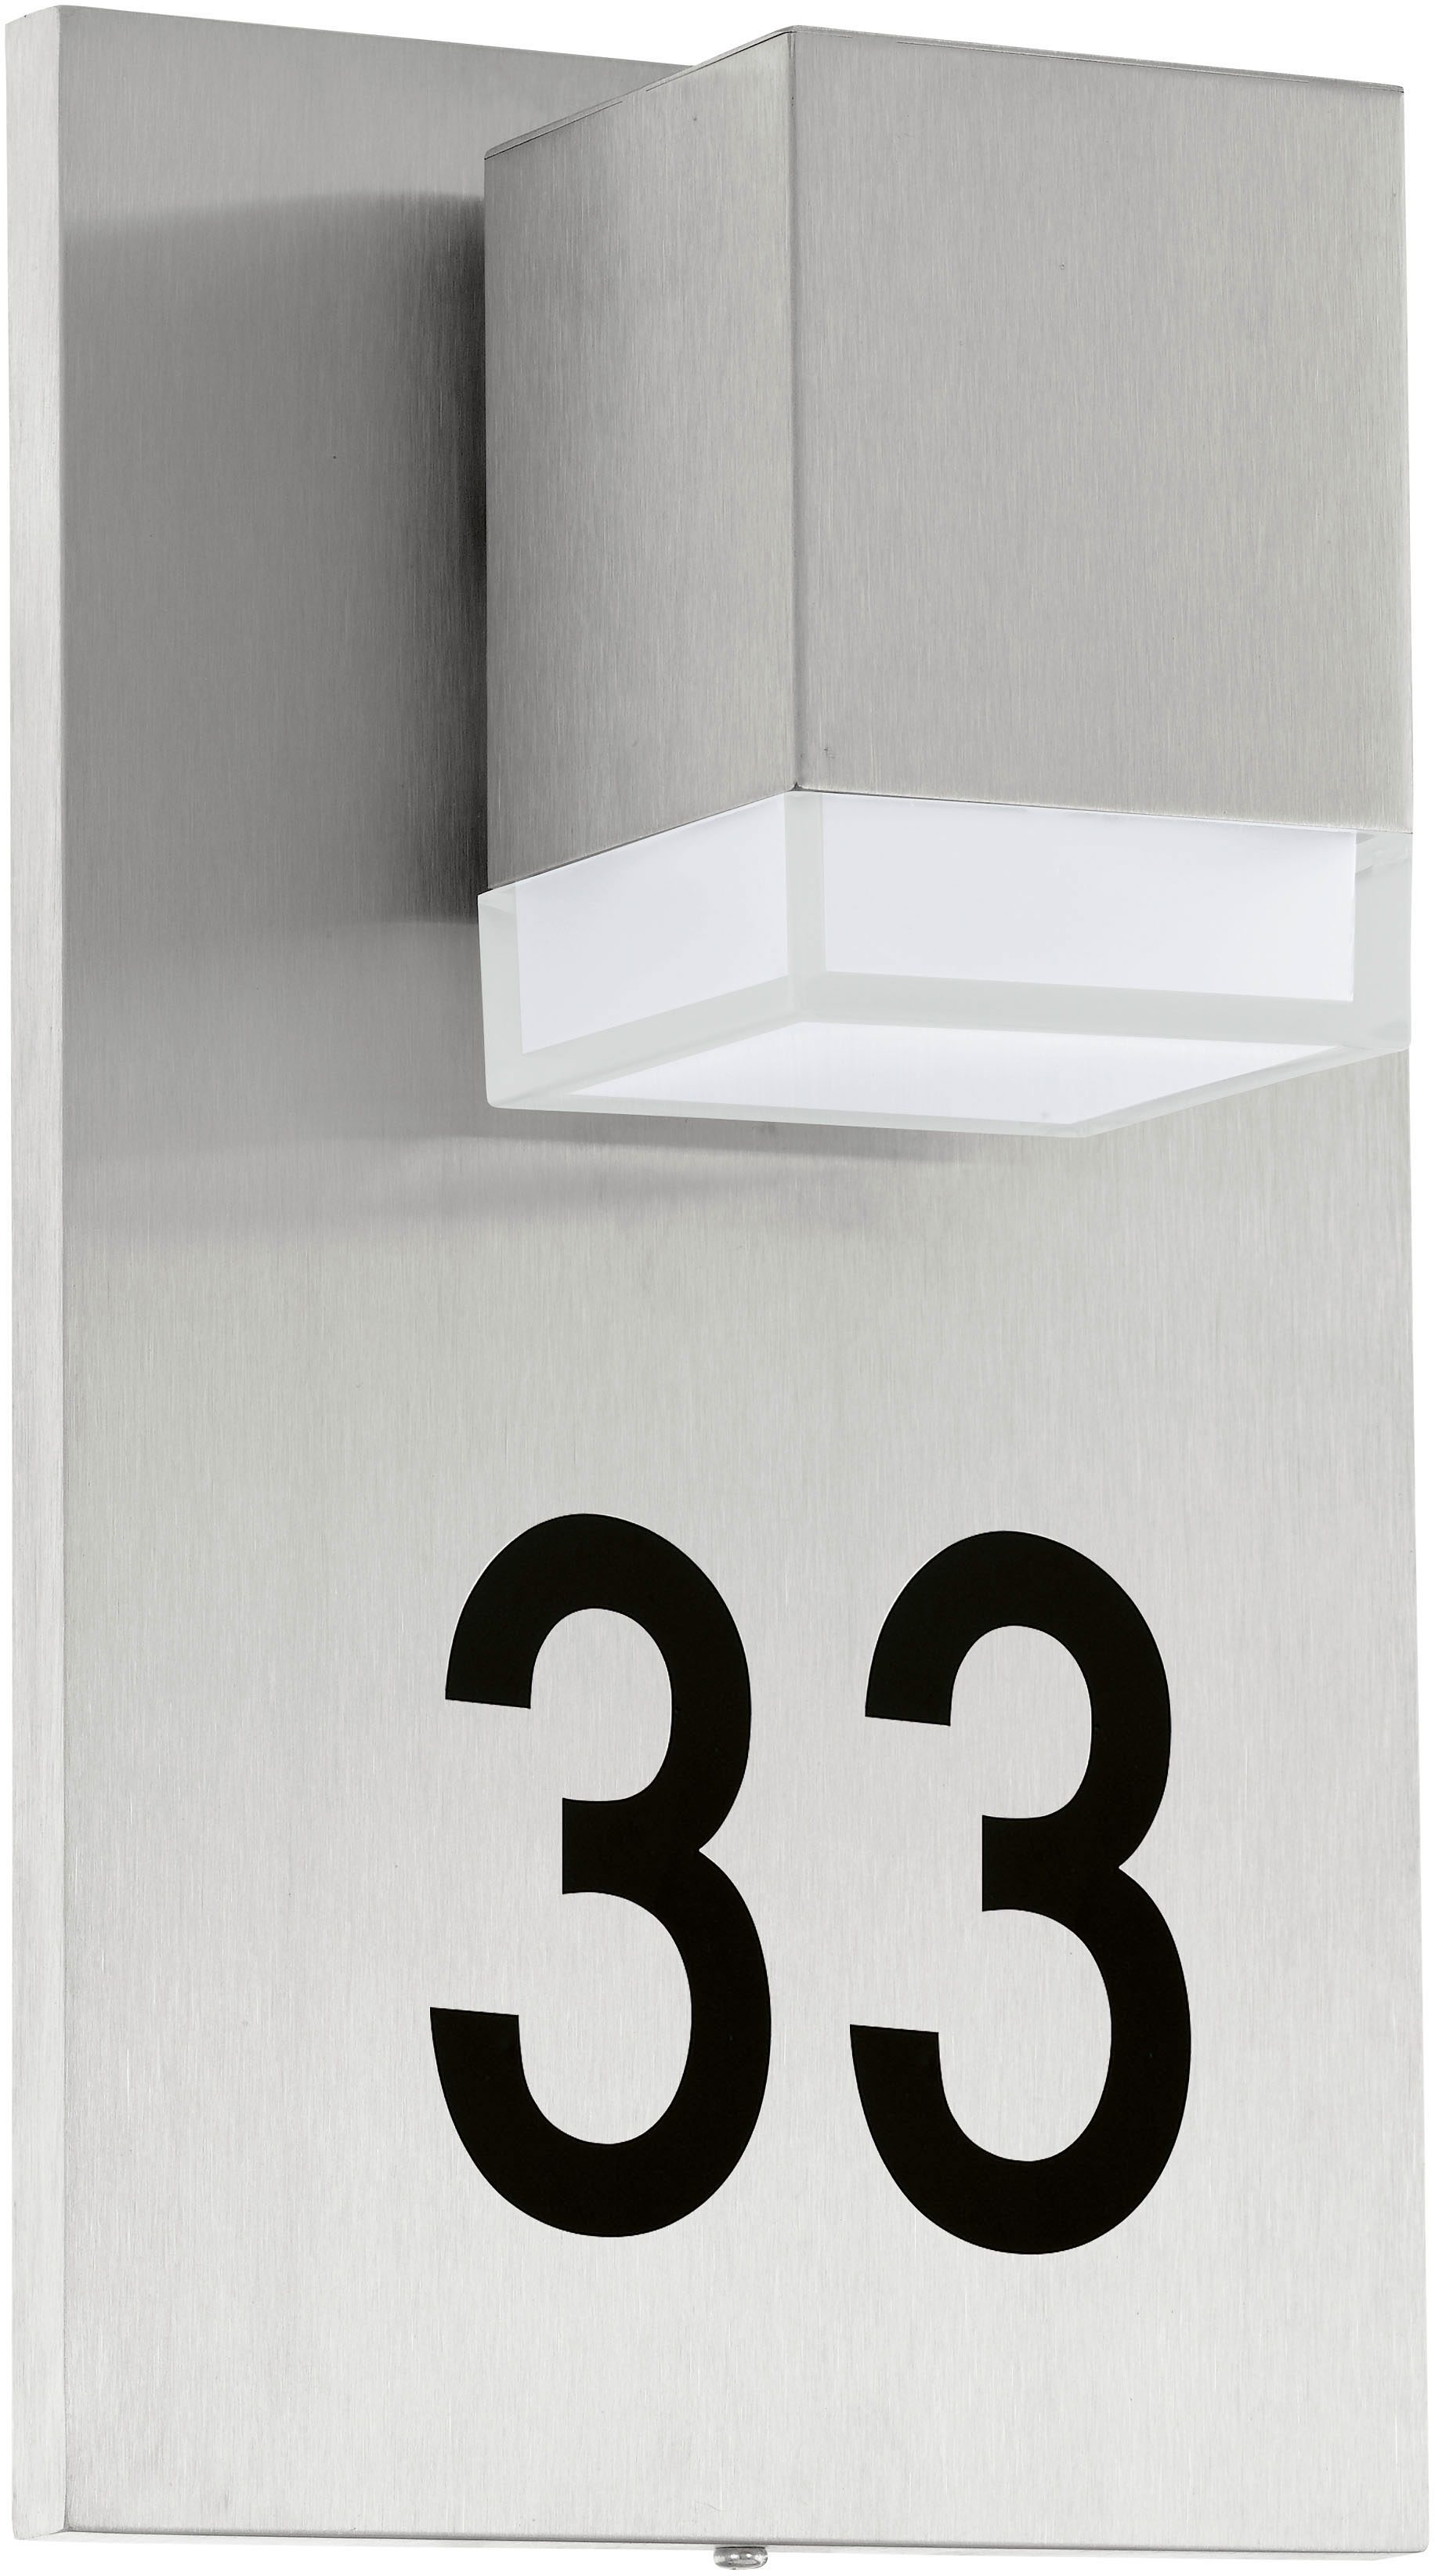 Eglo LED Außenleuchte, 1 flg., Wandleuchte, »Pardela1«